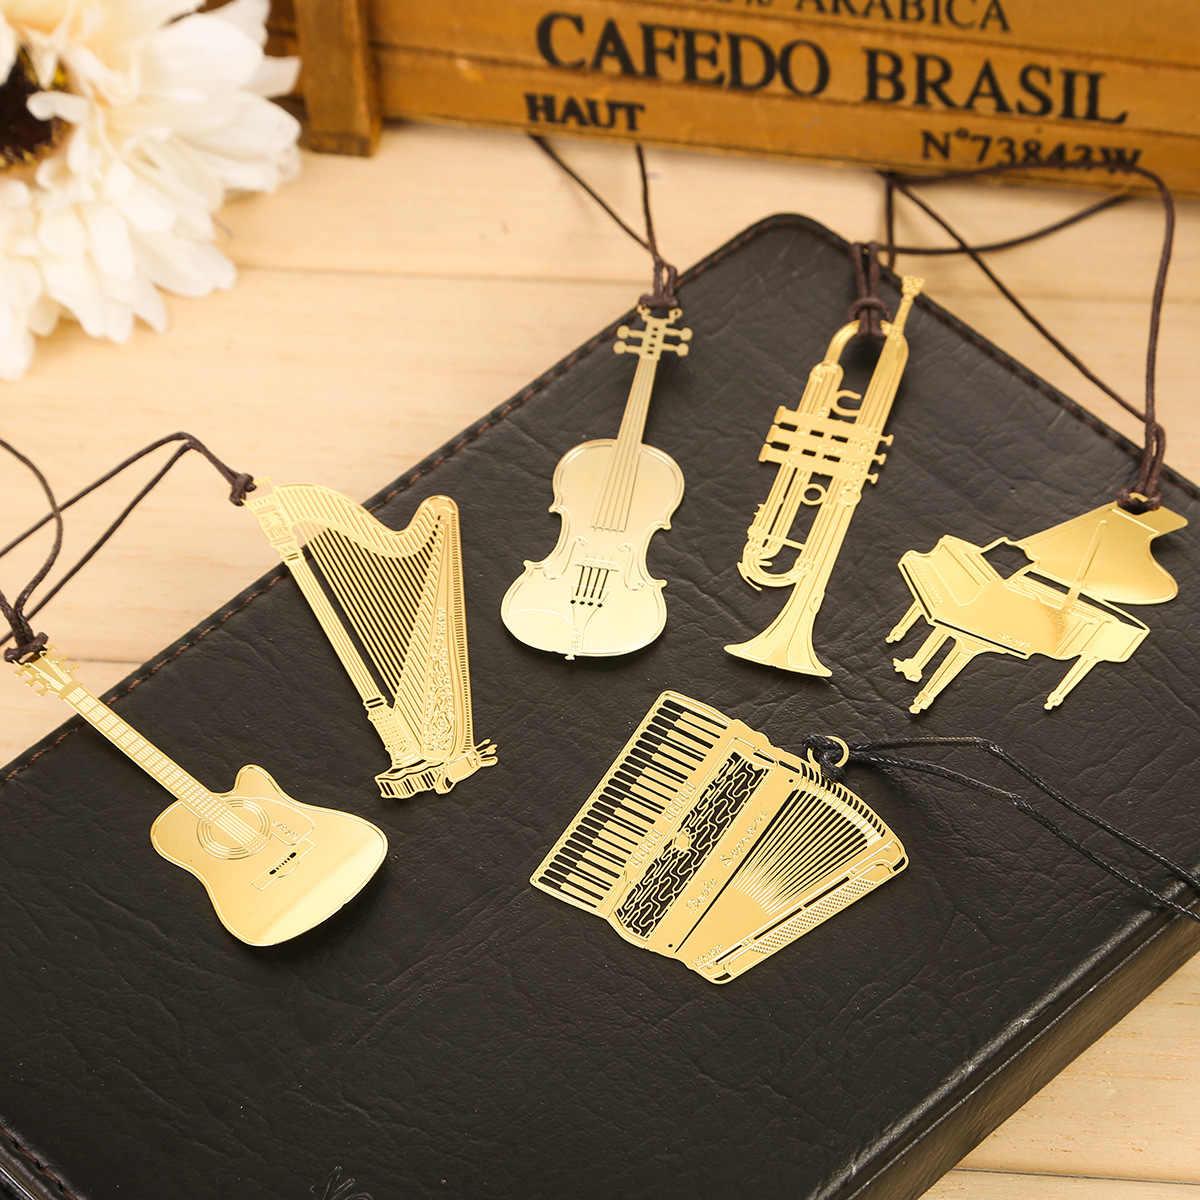 1 pc bonito marcador de metal moda musical piano guitarra marcador para livro presente criativo coreano papelaria presentes